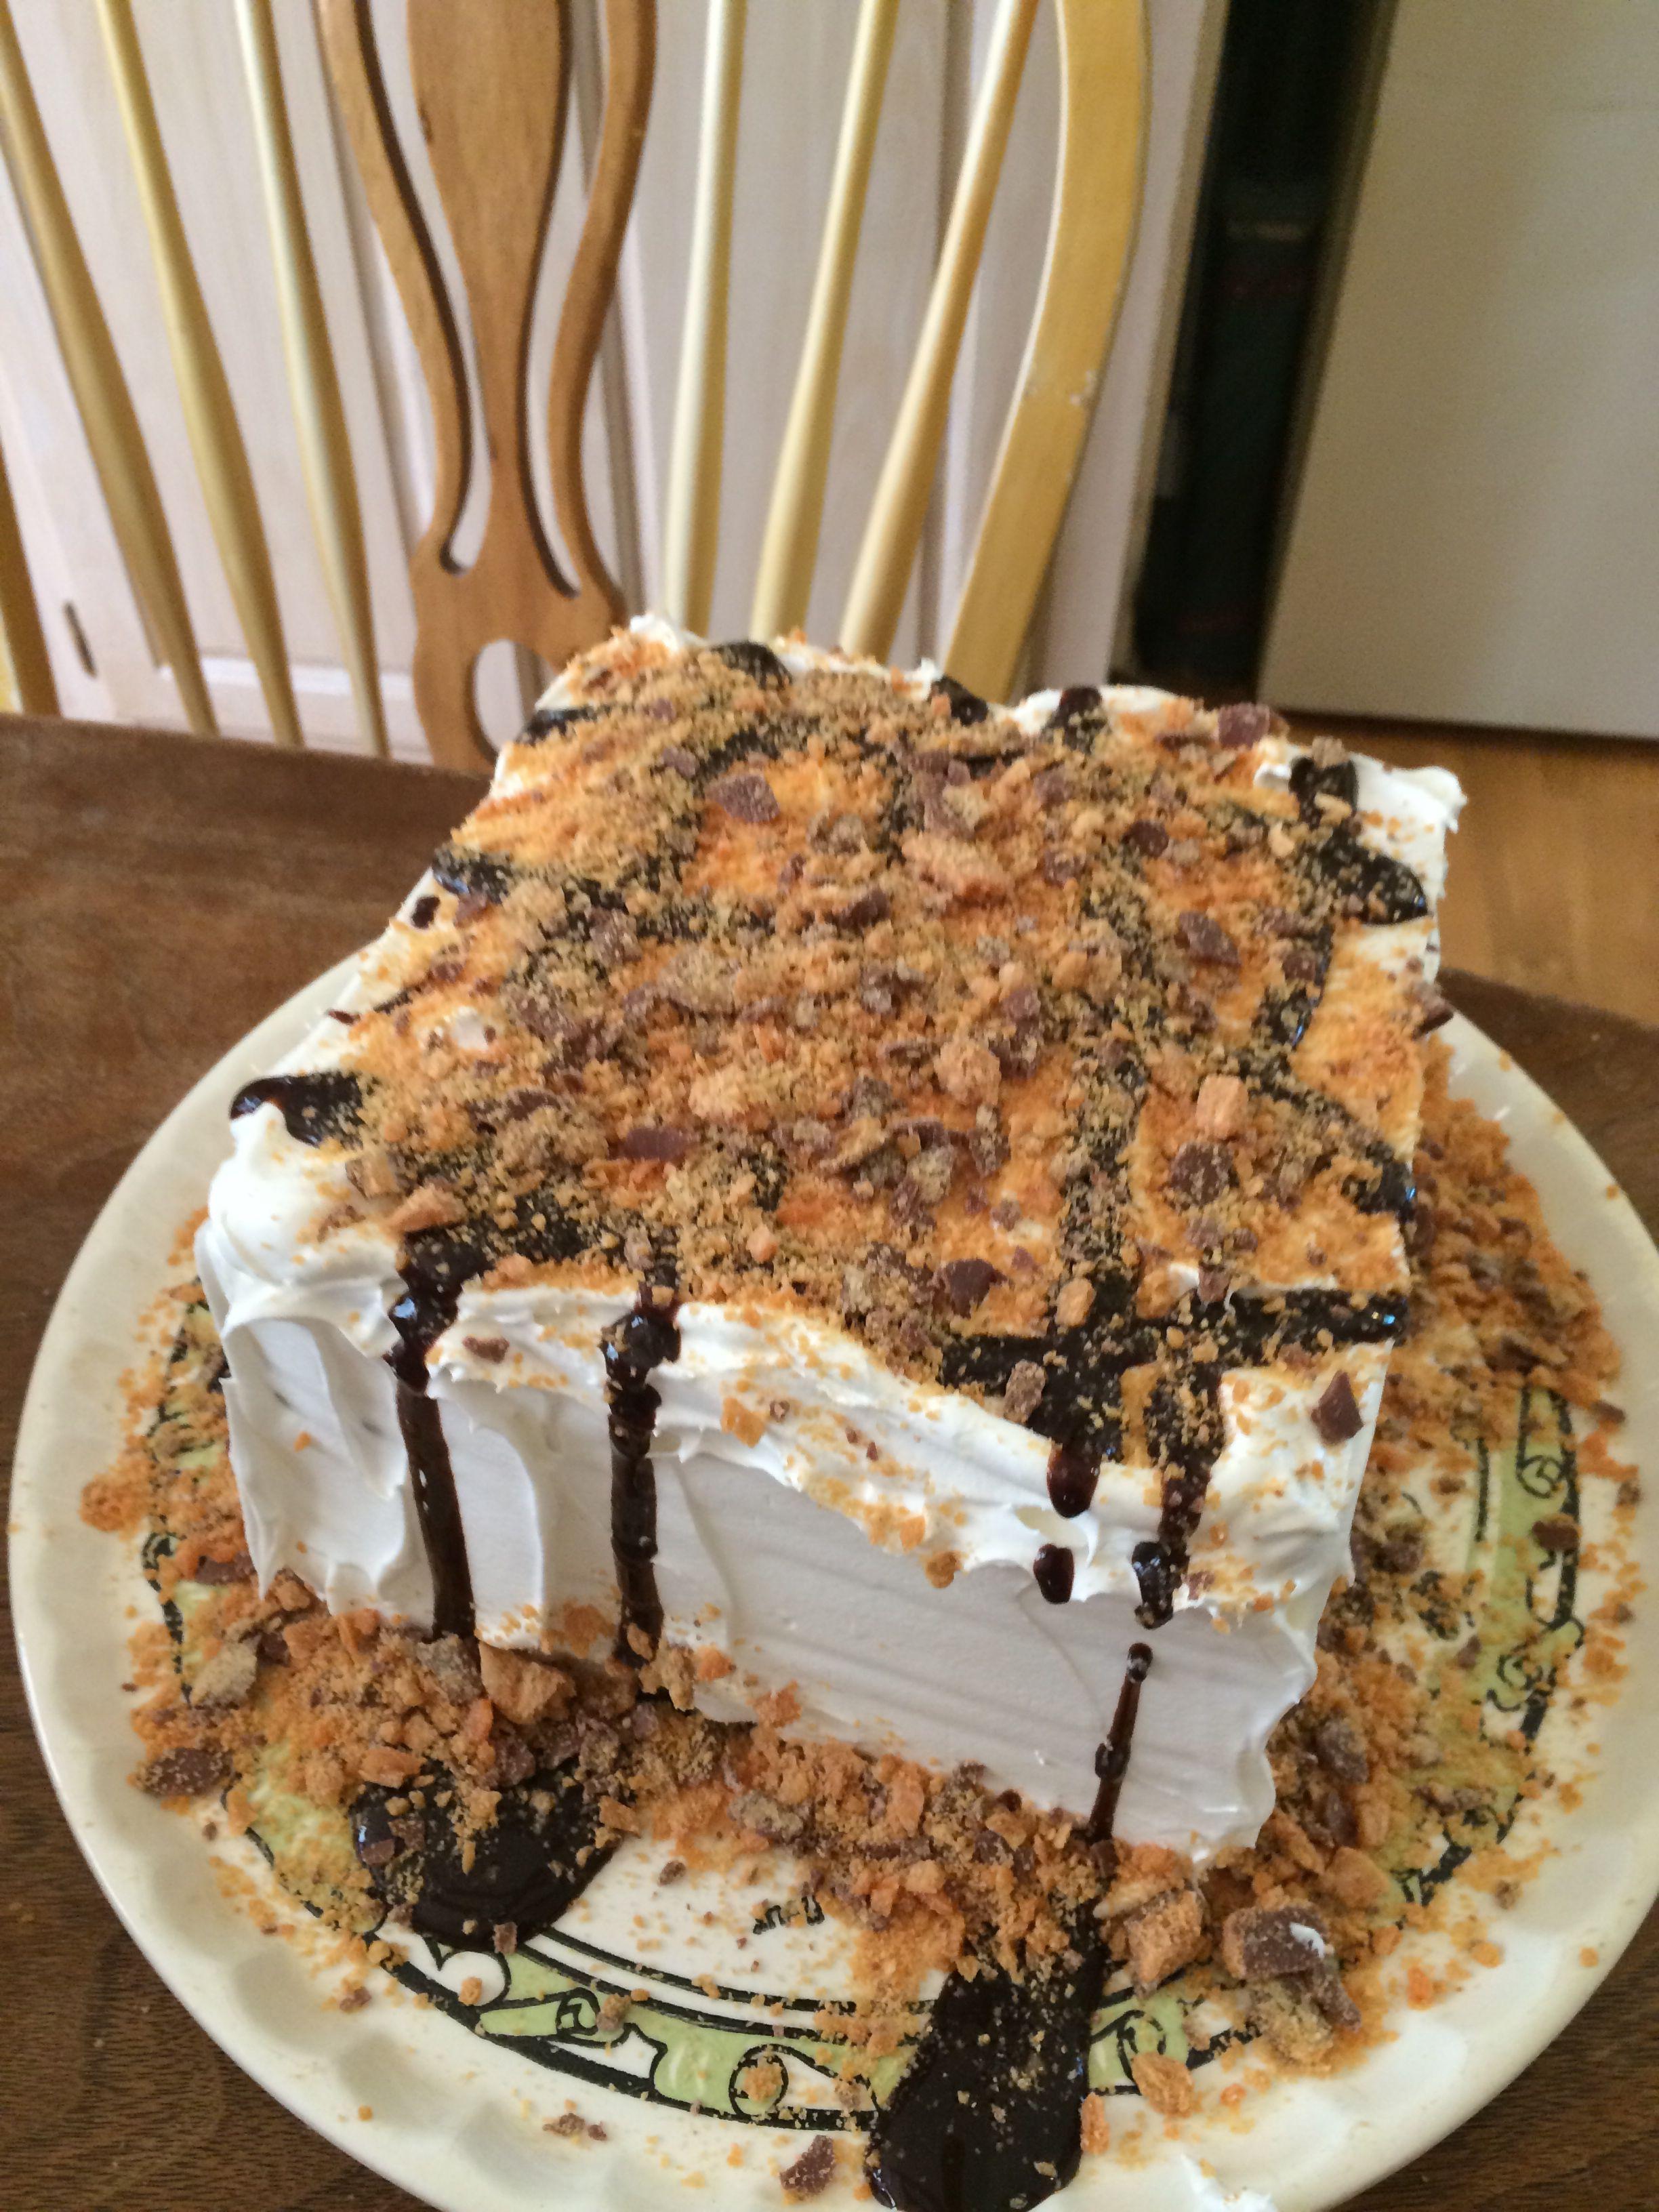 The Icecream cake I made